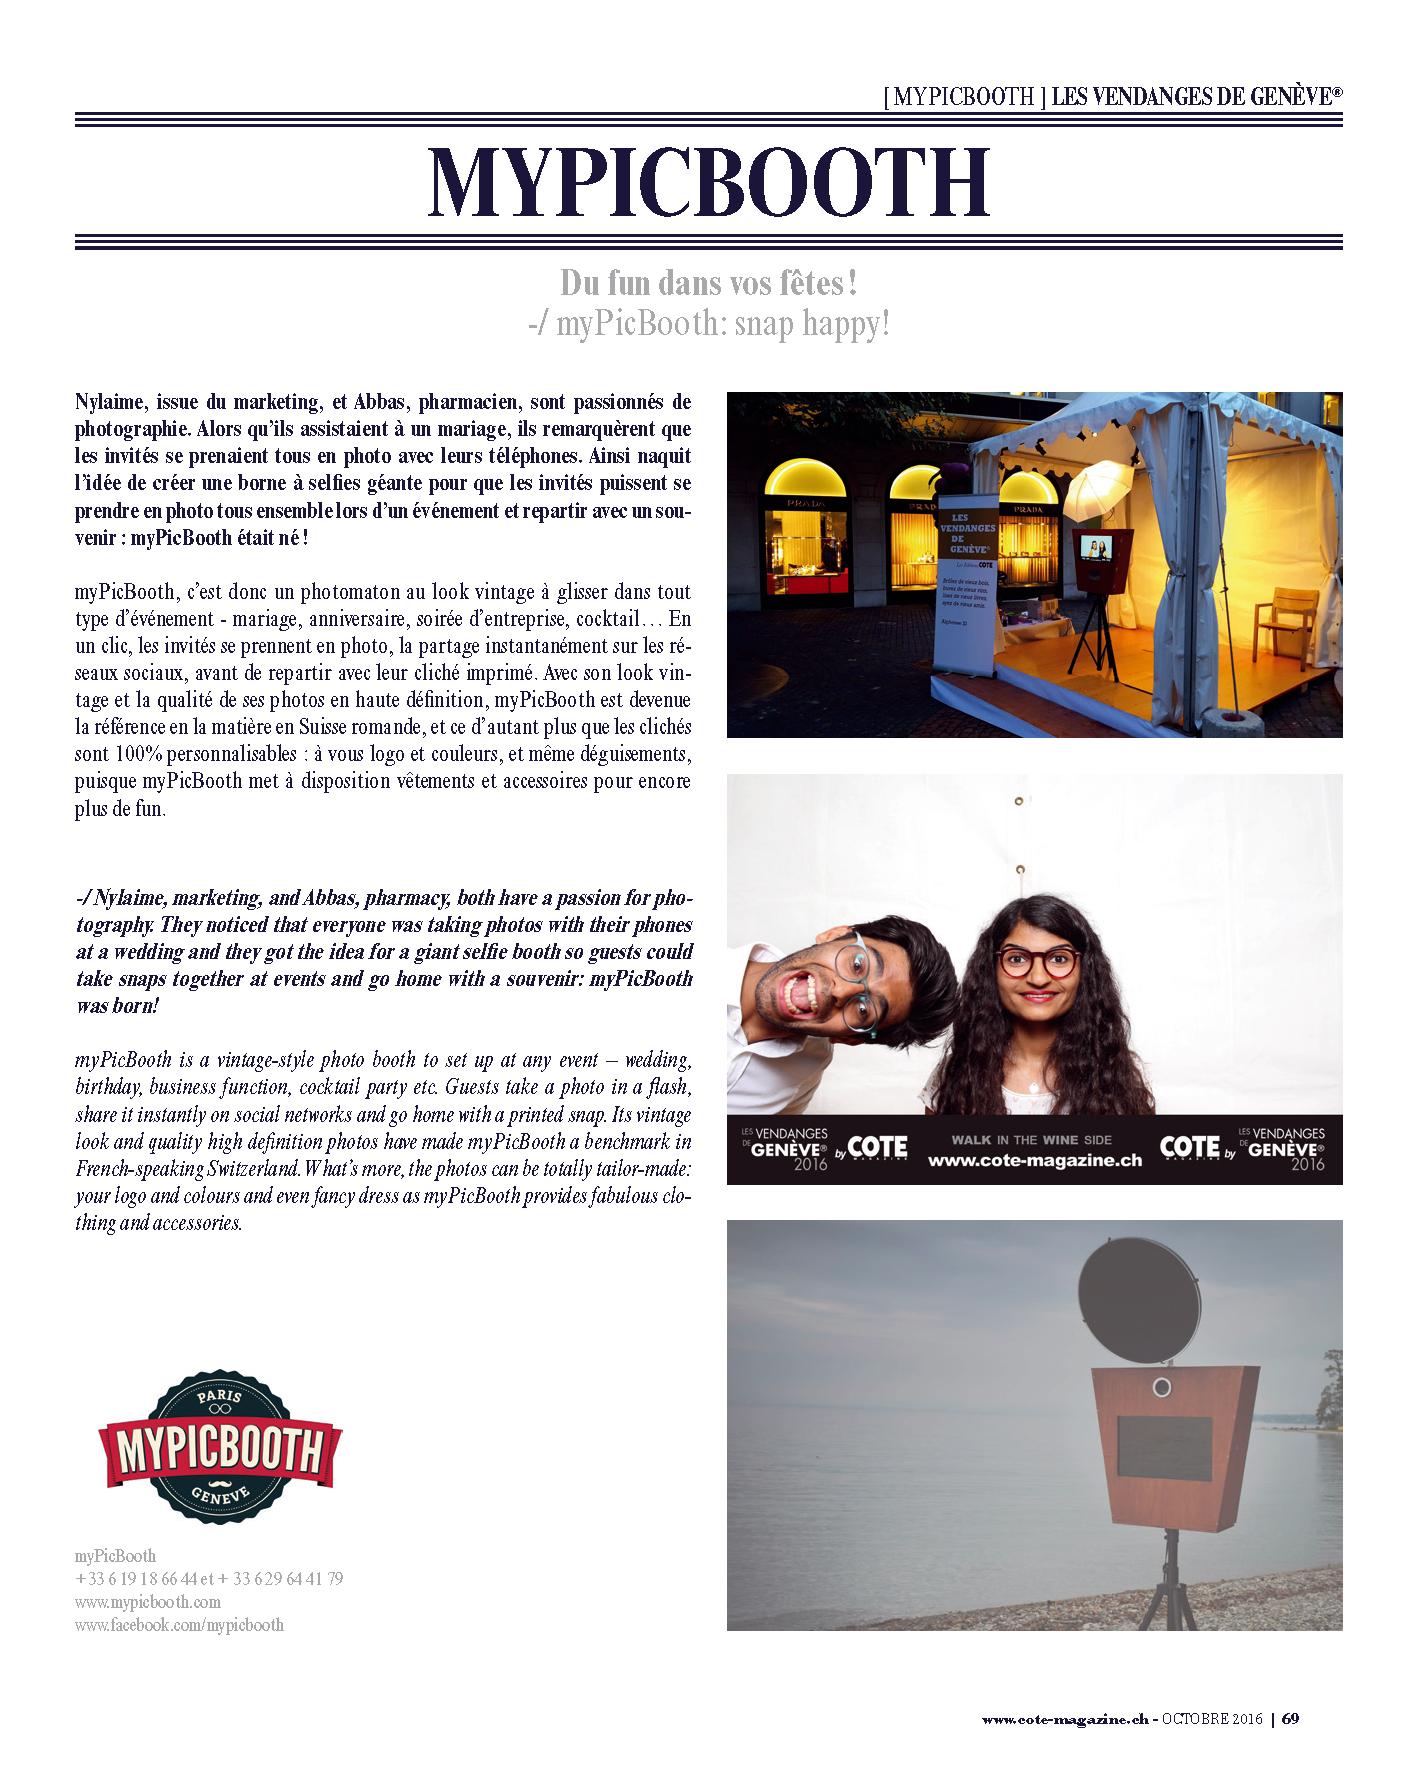 Cote Magazine - myPicBooth